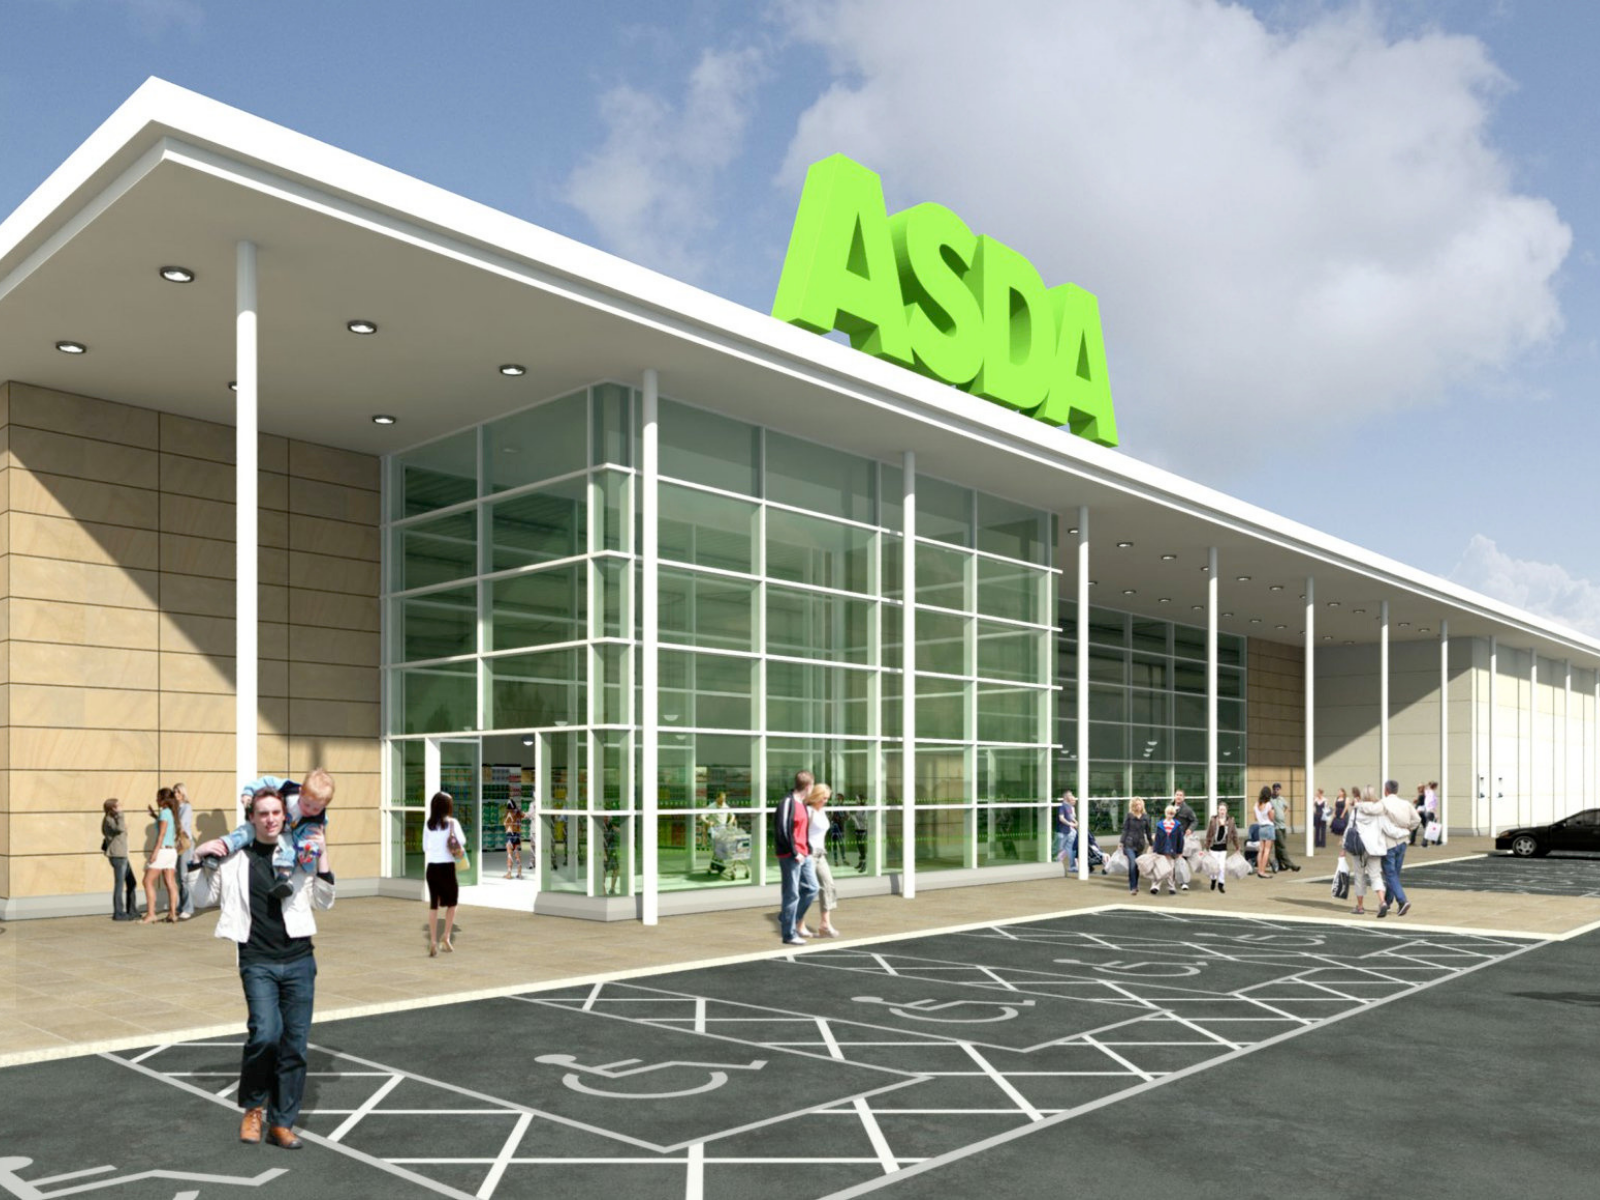 Asda storefront